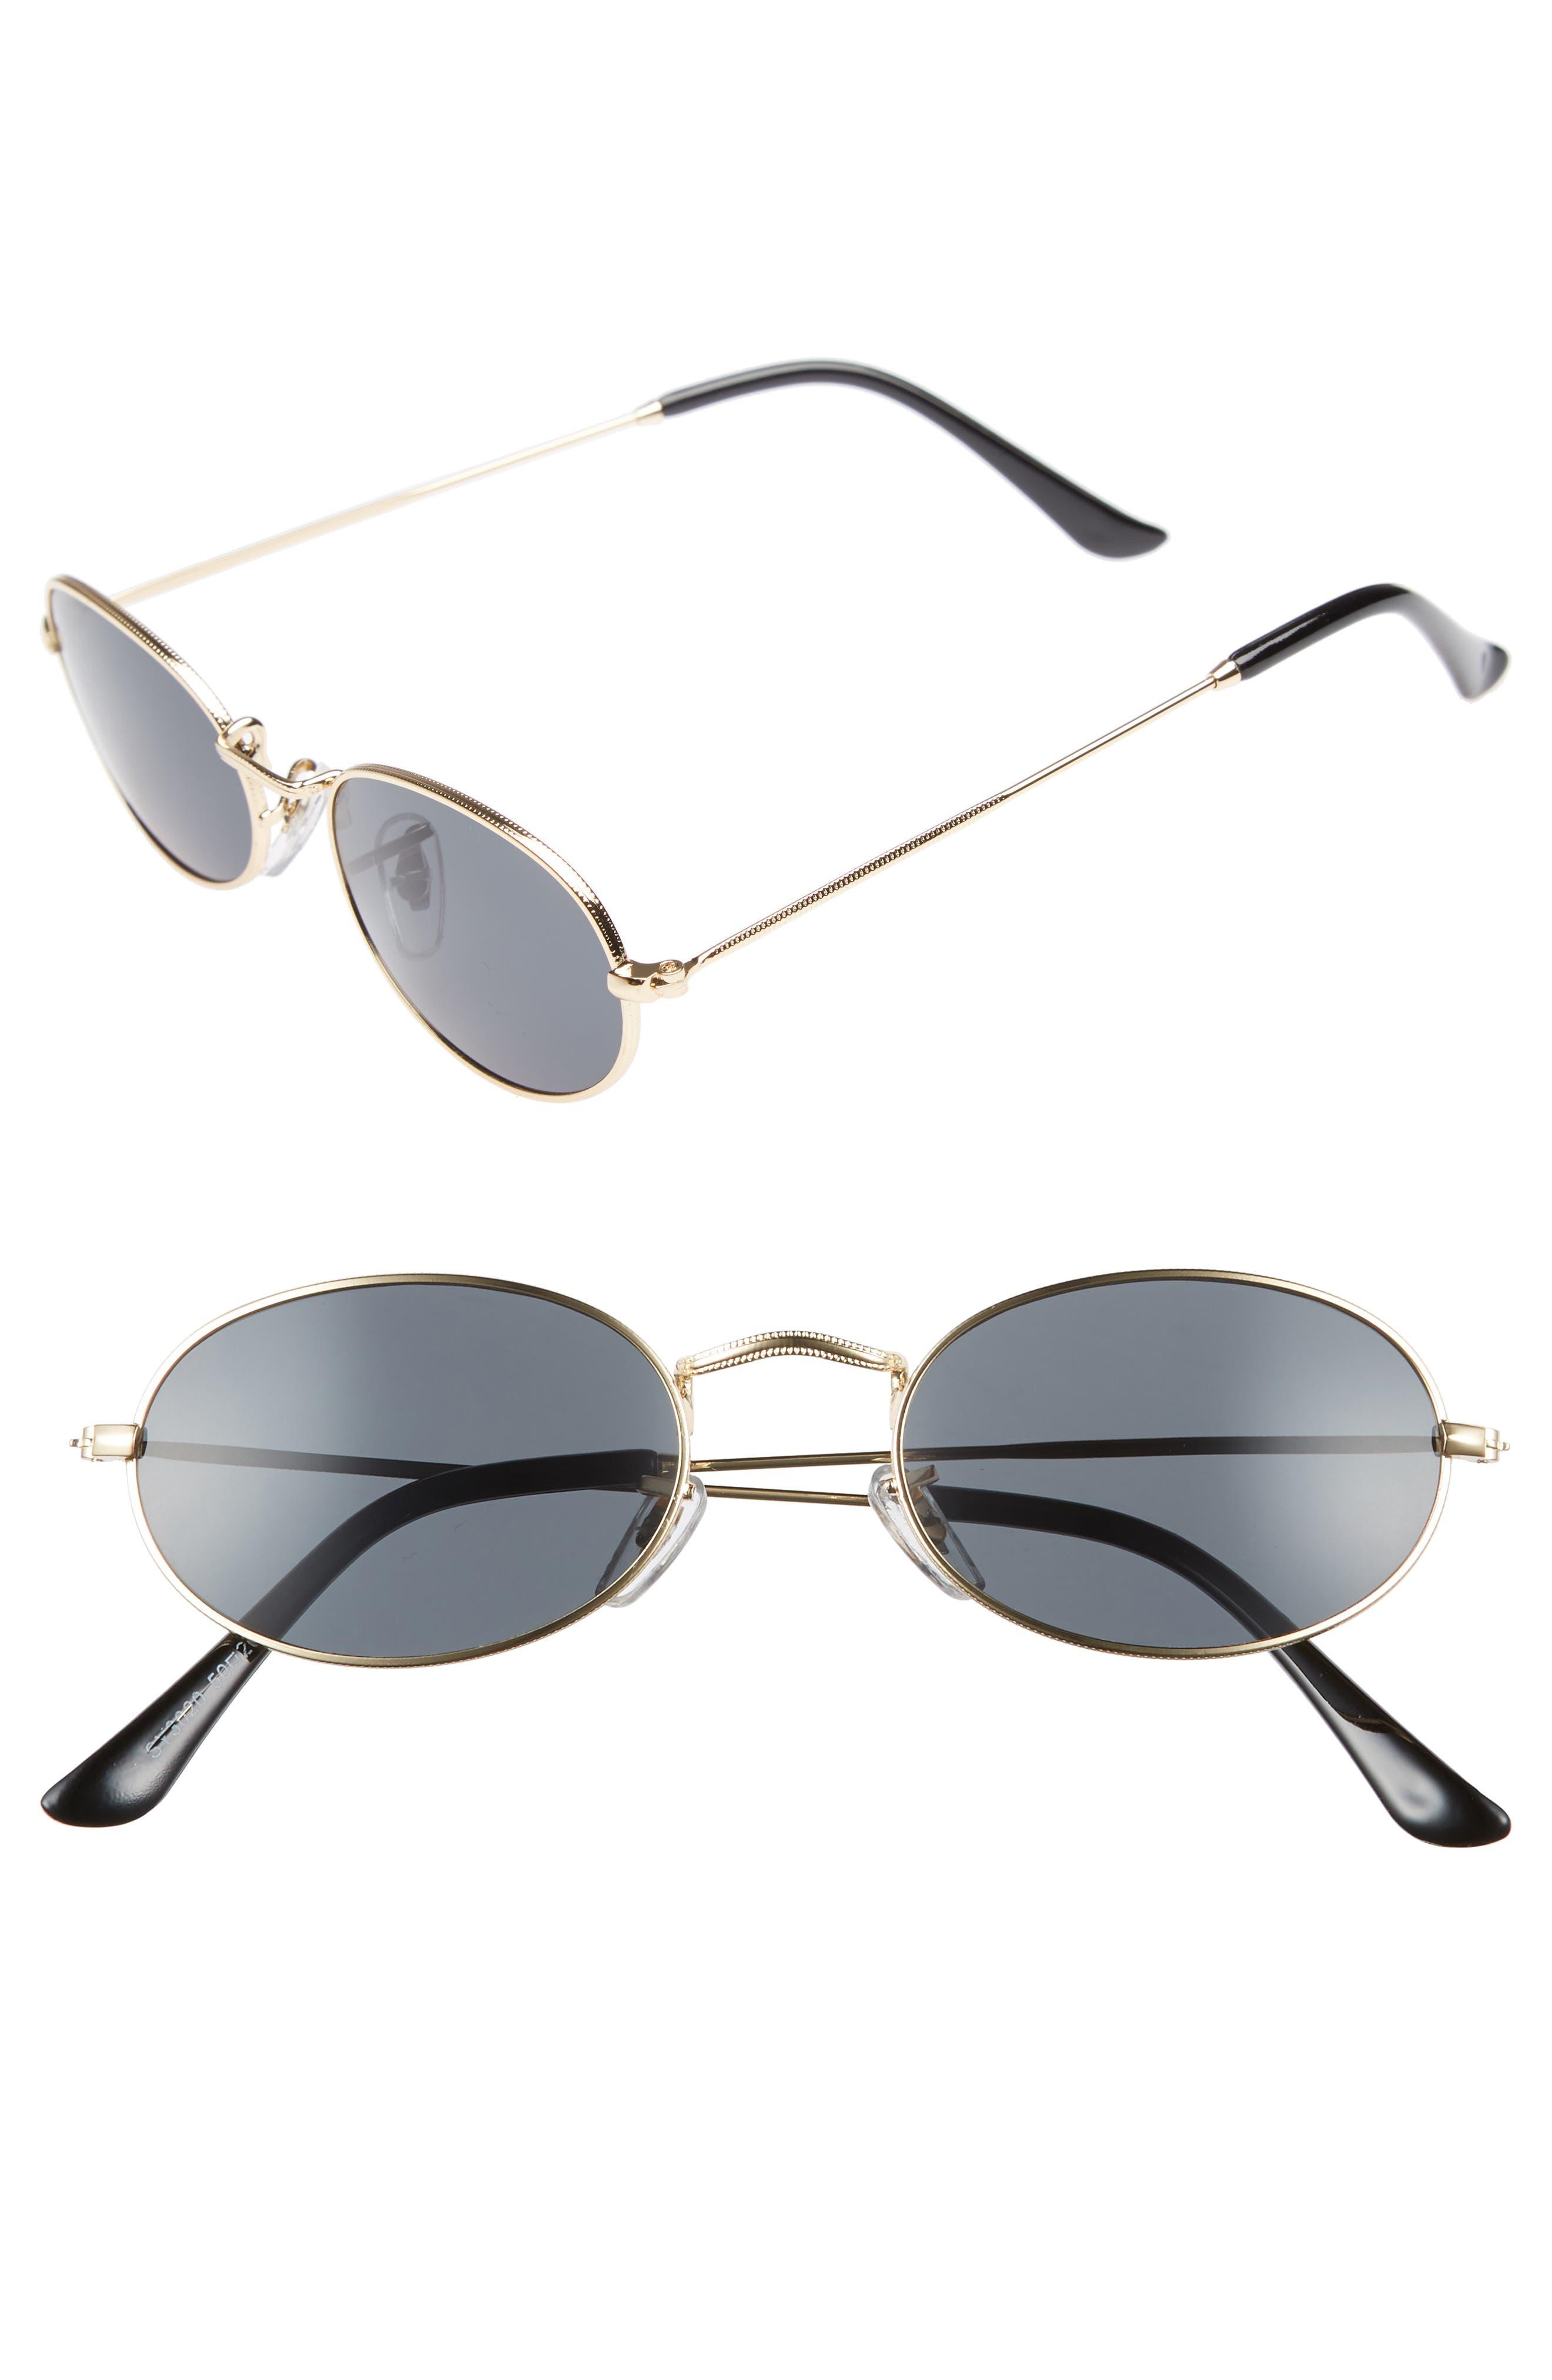 50mm Round Sunglasses,                         Main,                         color, GOLD/ BLACK